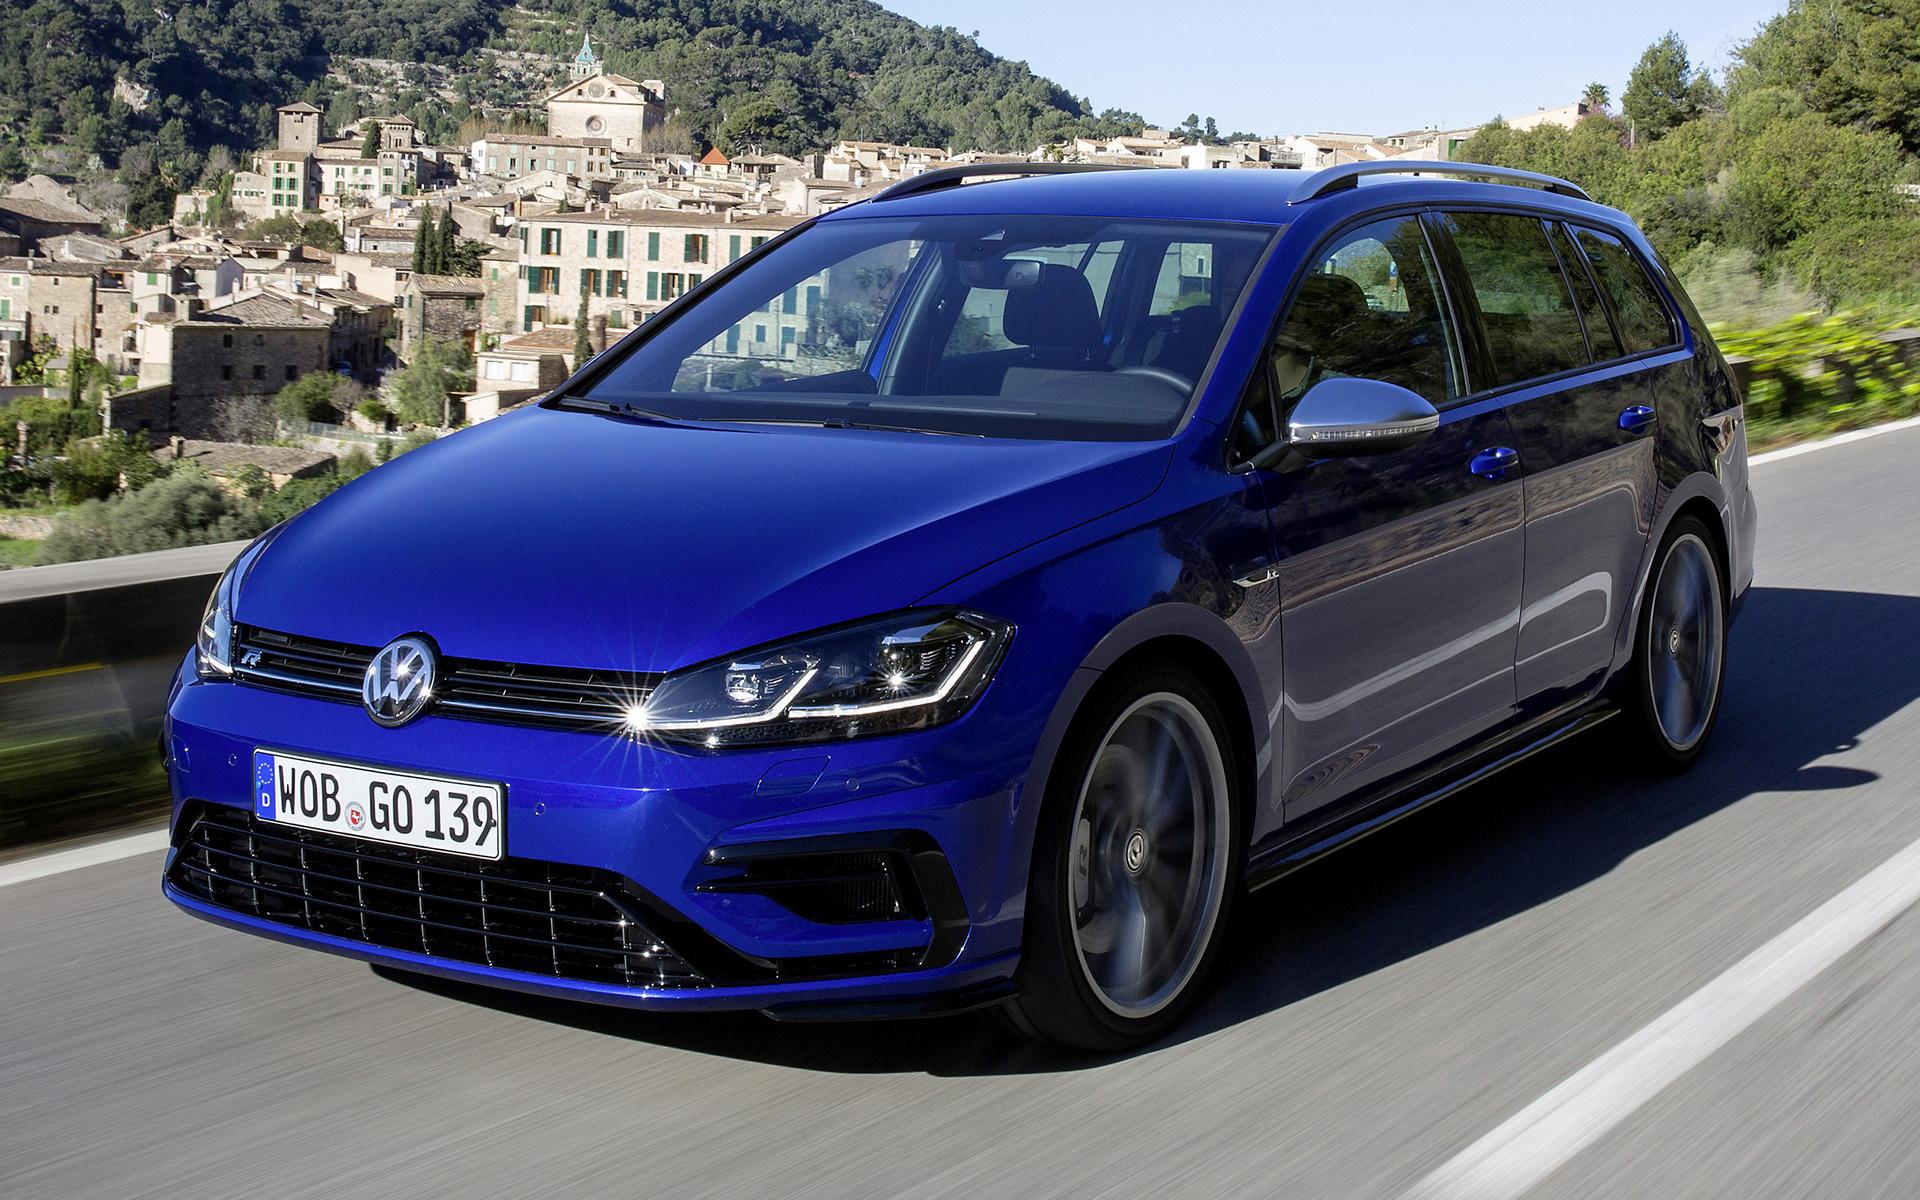 Volkswagen Golf R >> 2017 Volkswagen Golf R Variant - Wallpapers and HD Images | Car Pixel